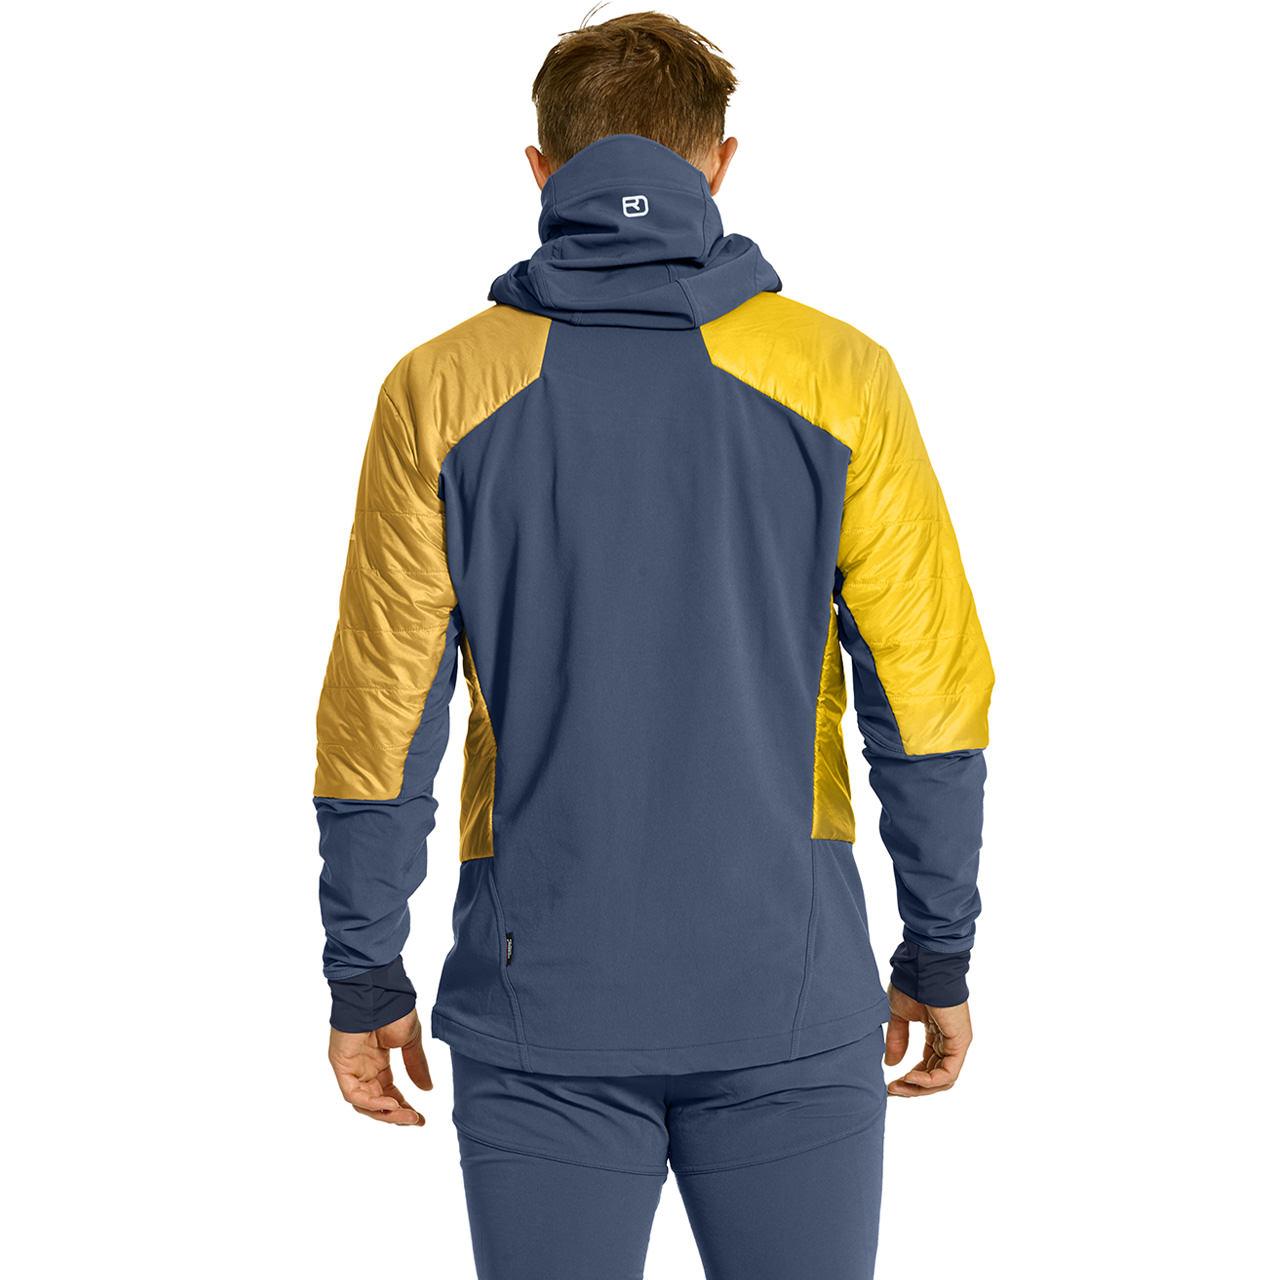 Ortovox Men Jacket PIZ PALÜ yellowstone